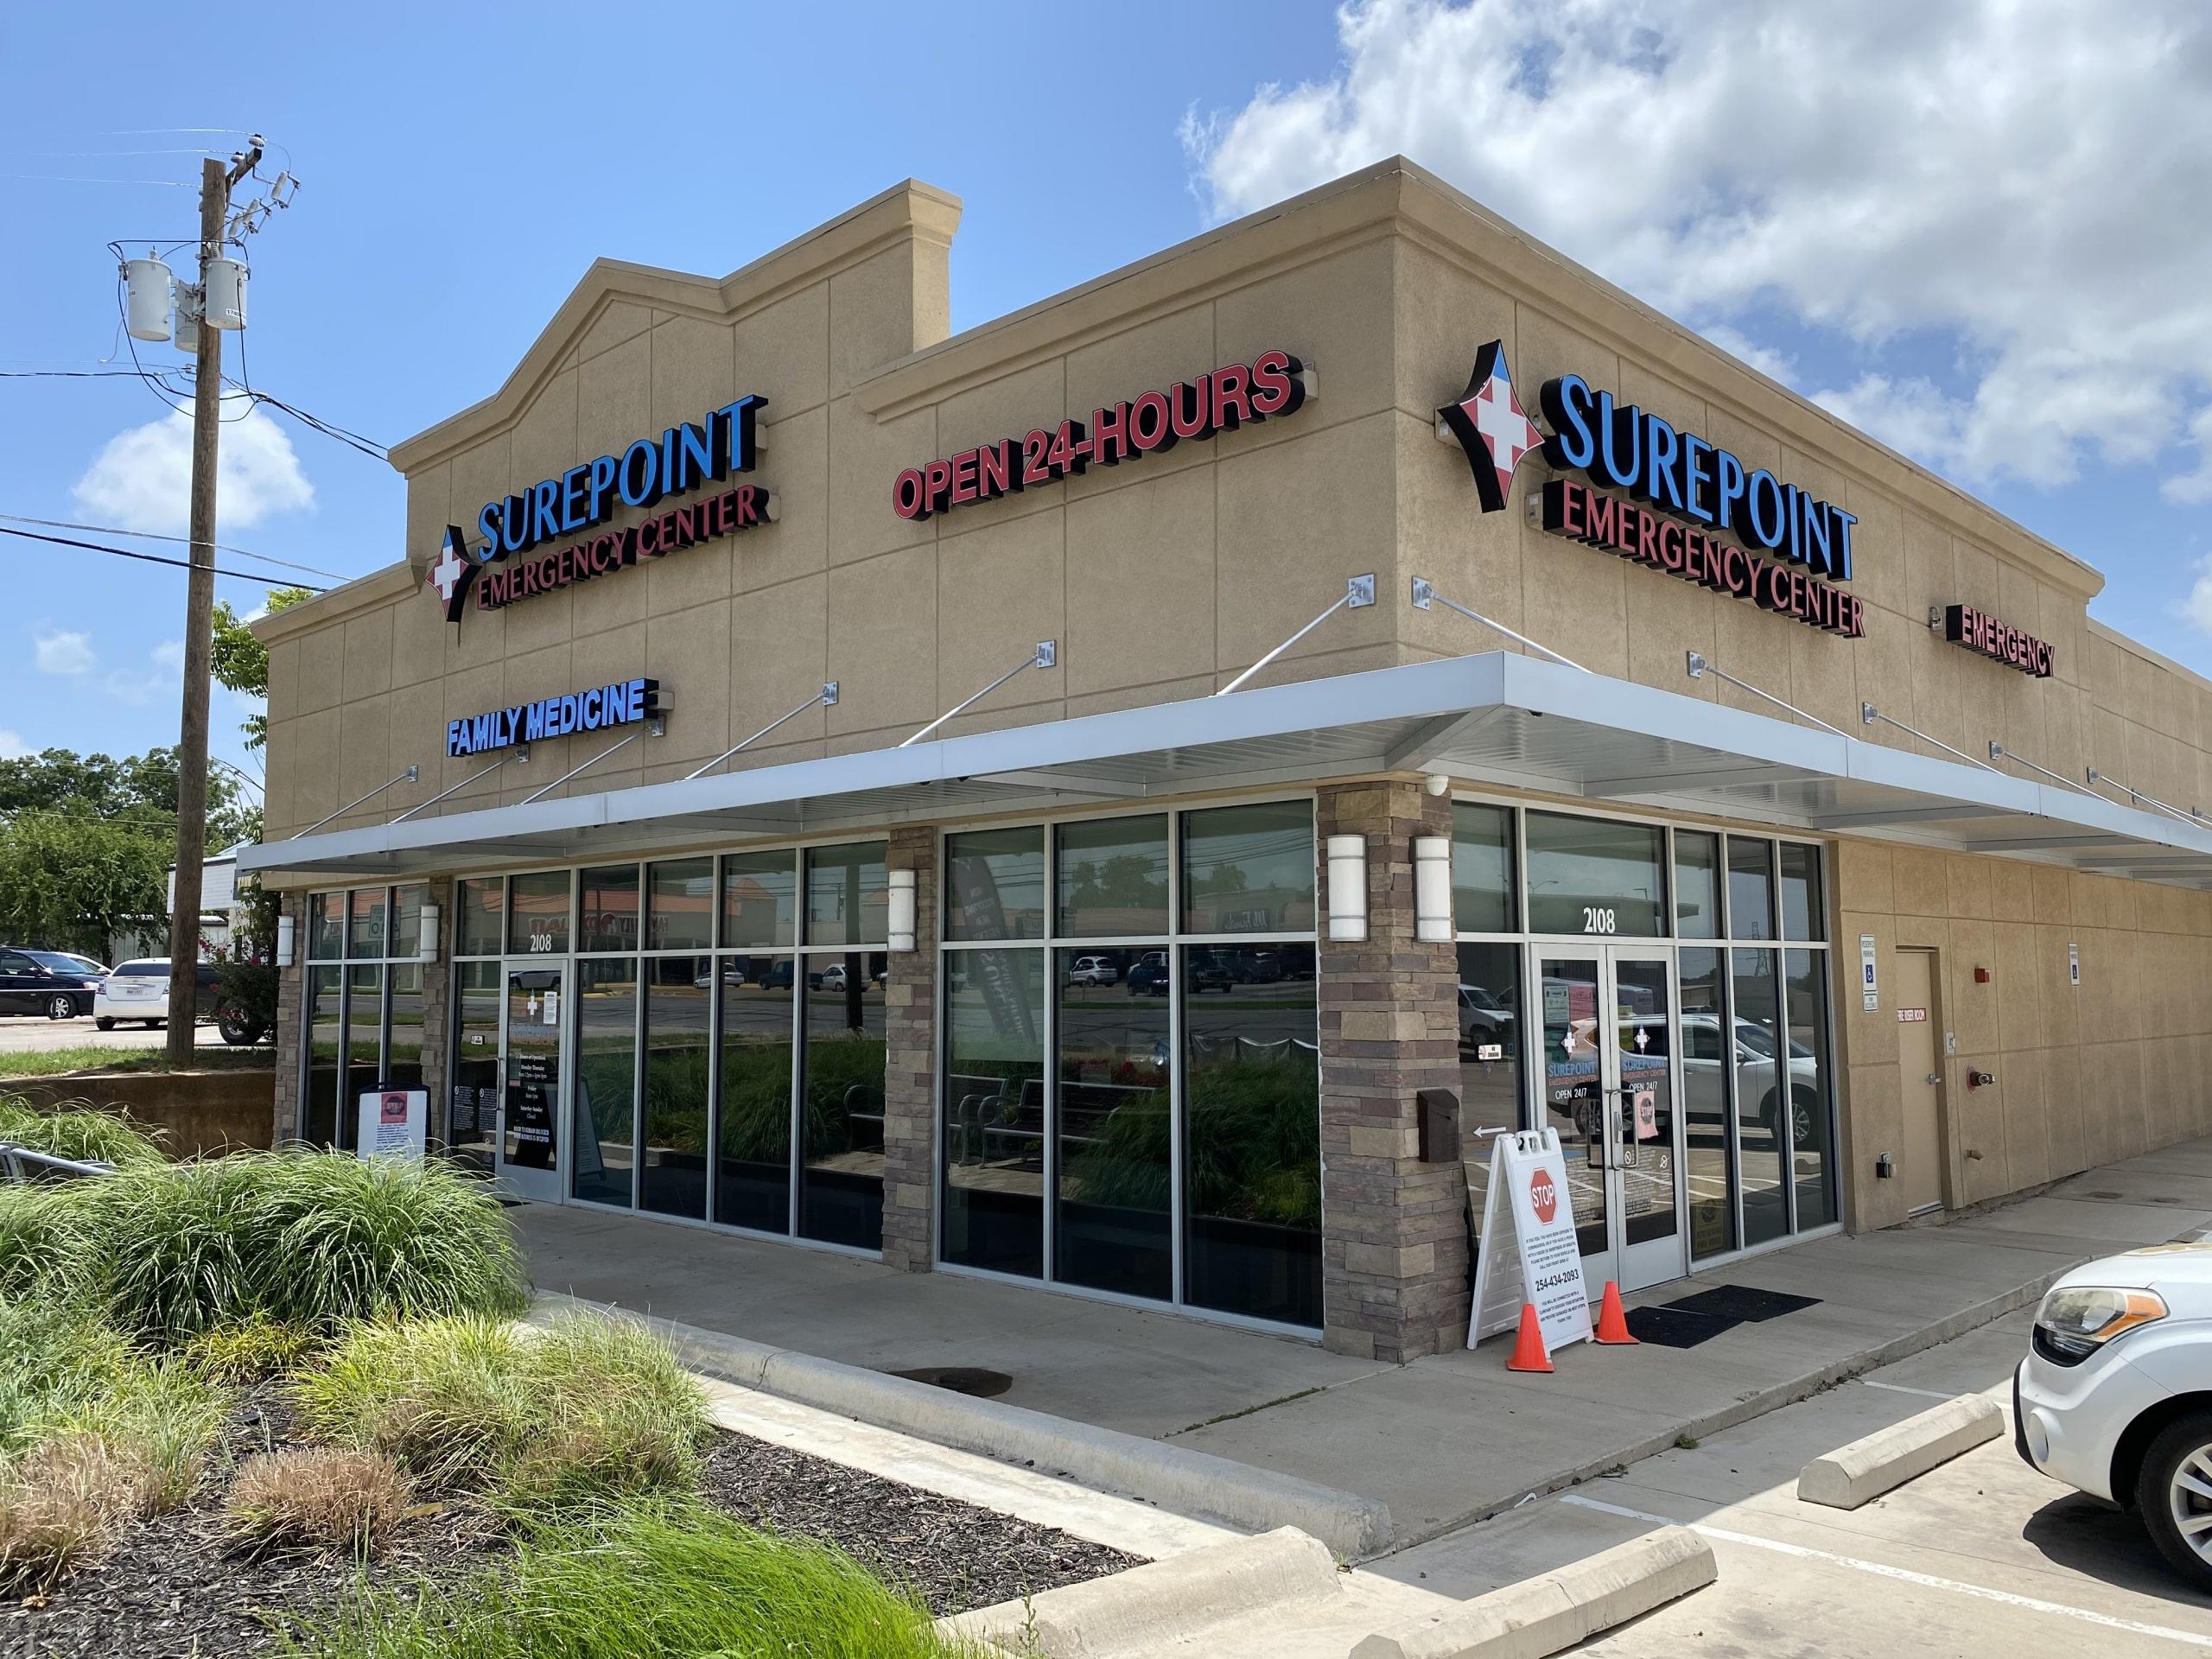 Surepoint Emergency Center Stephenville